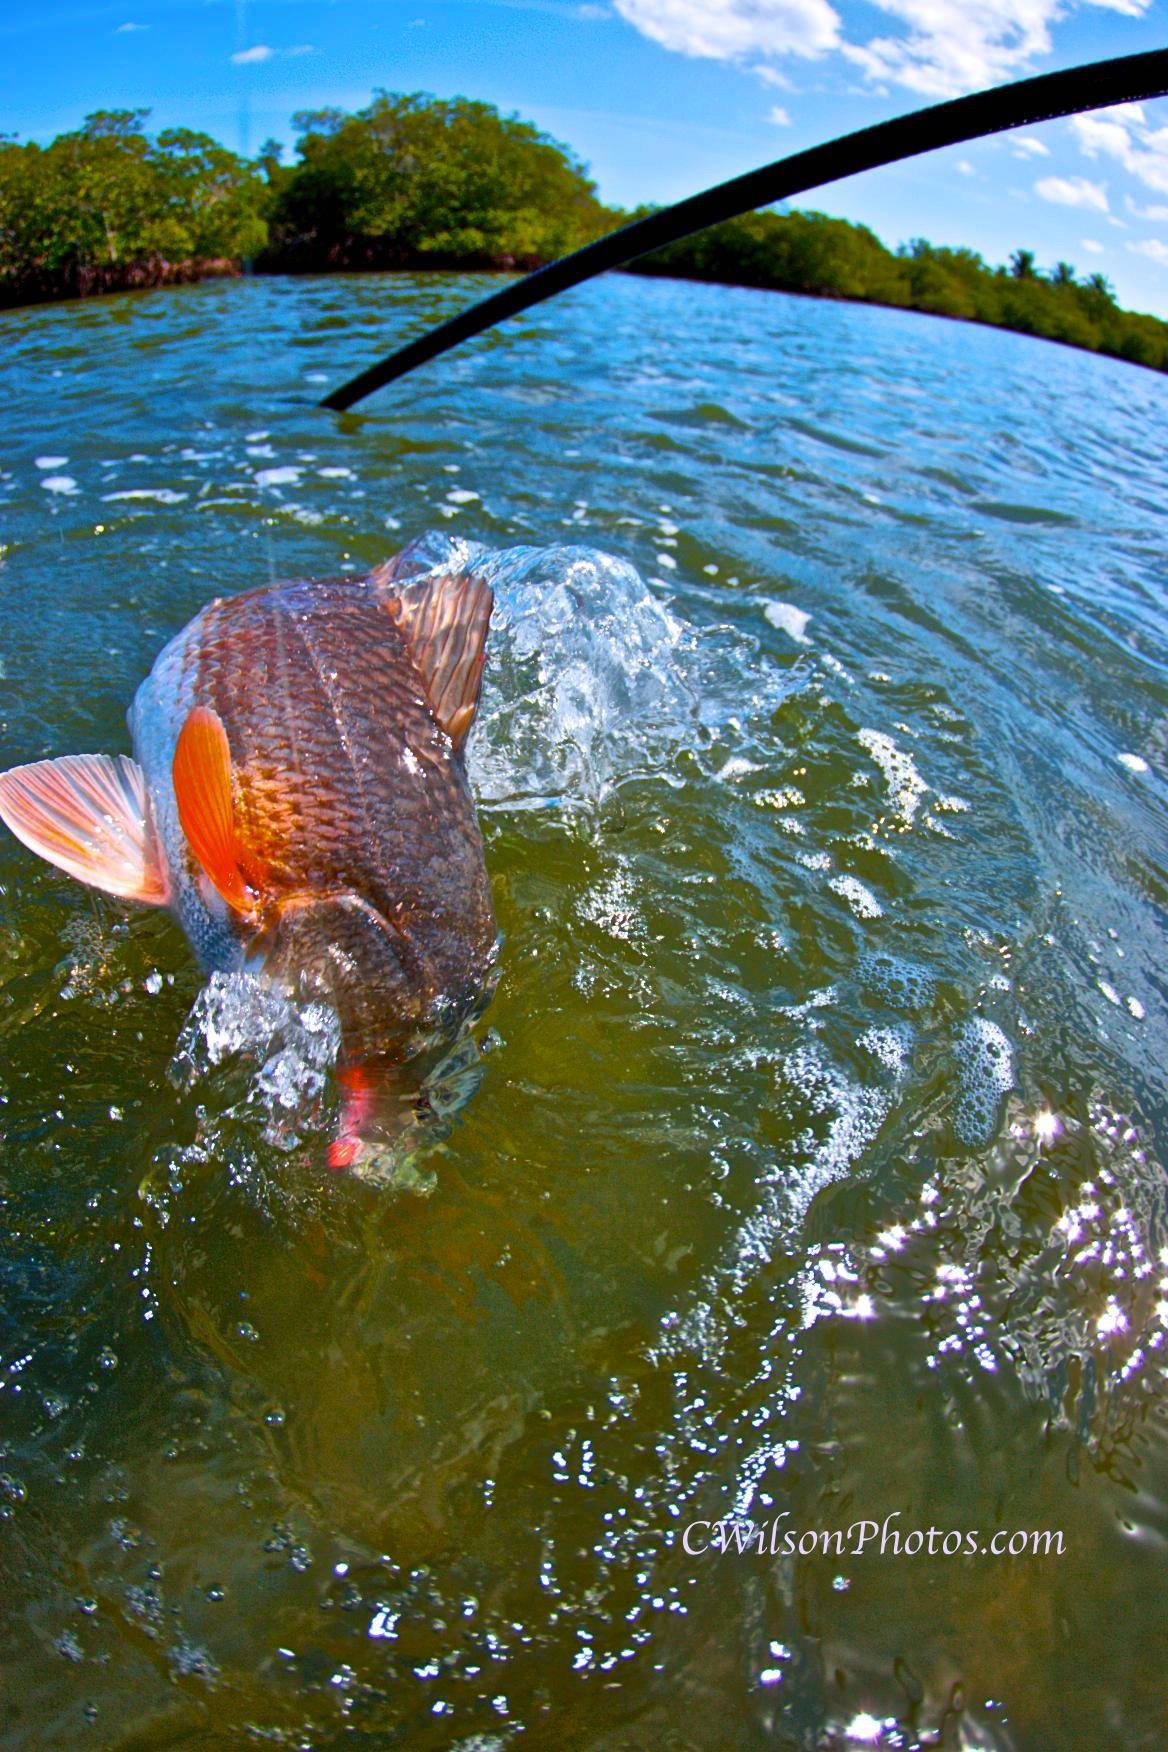 everglades-redfish-7.jpg